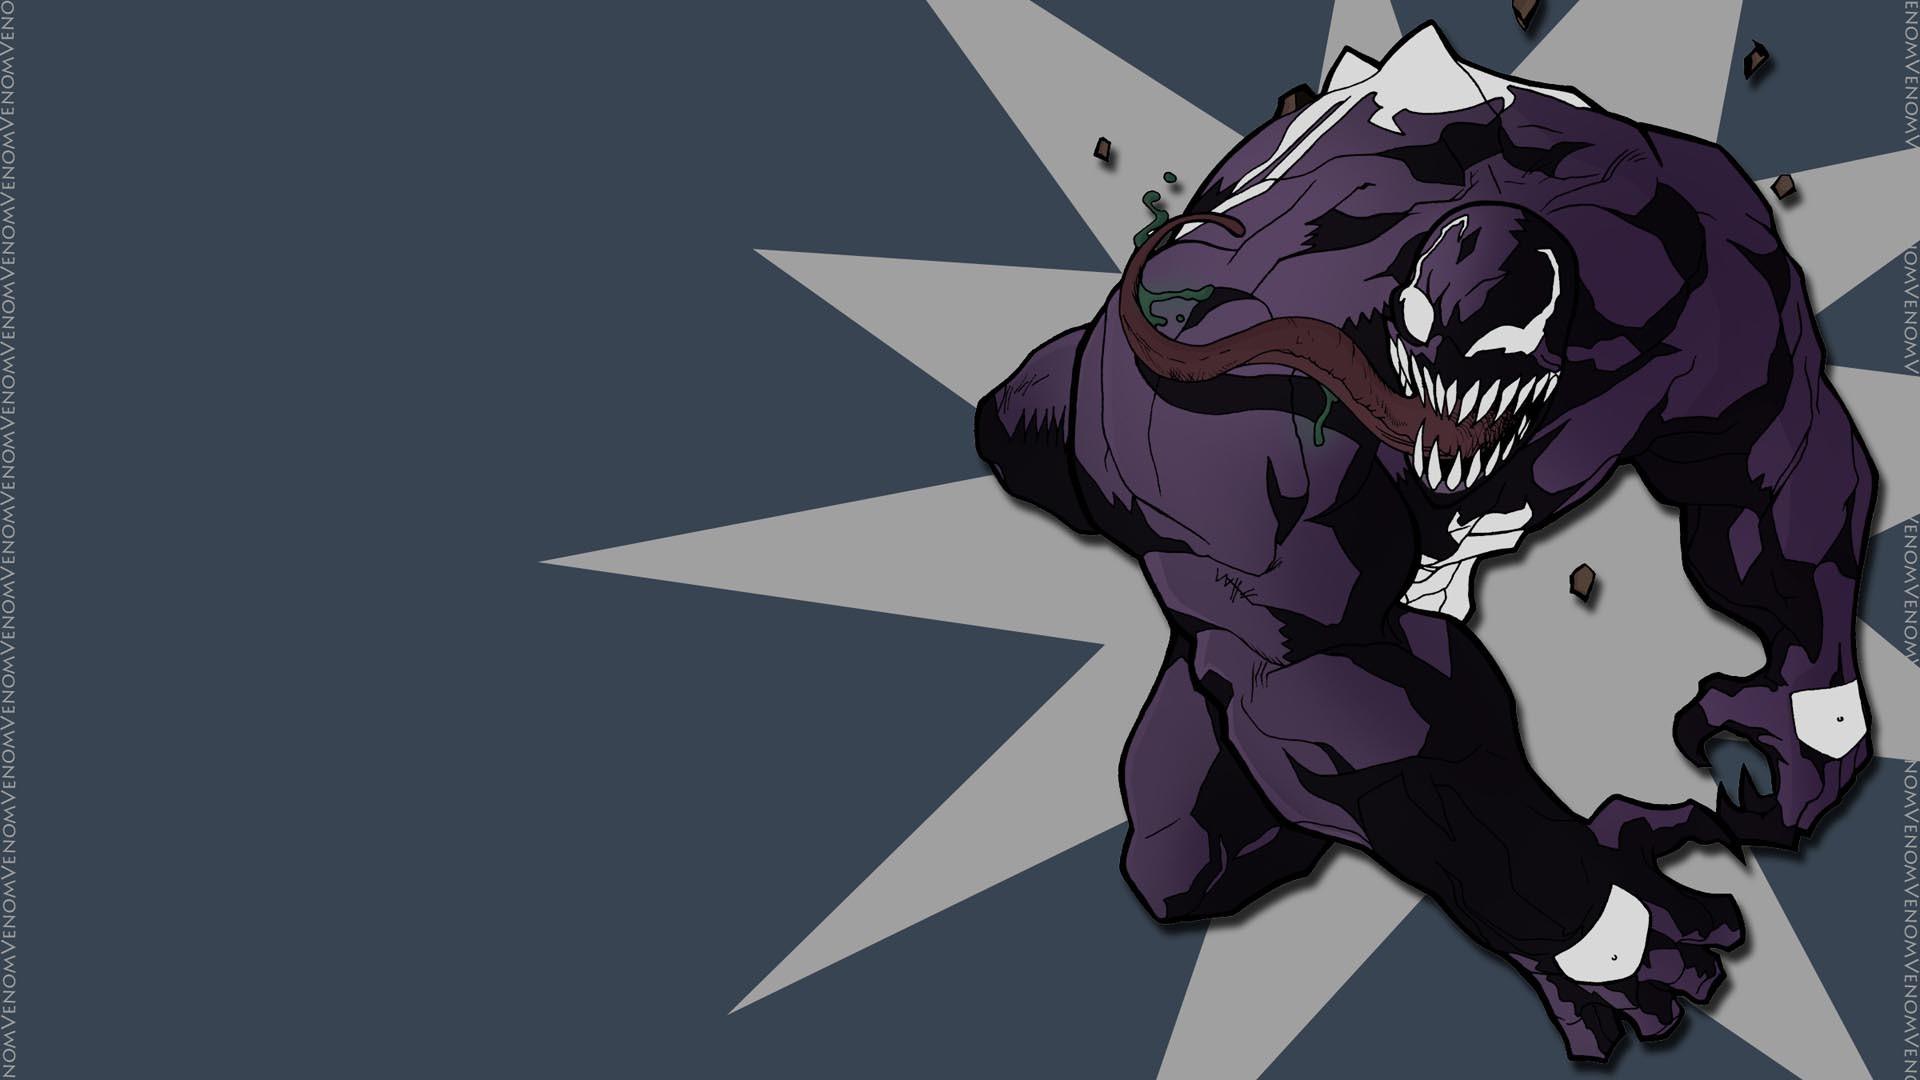 Wallpapers For > Venom Wallpaper 1080p